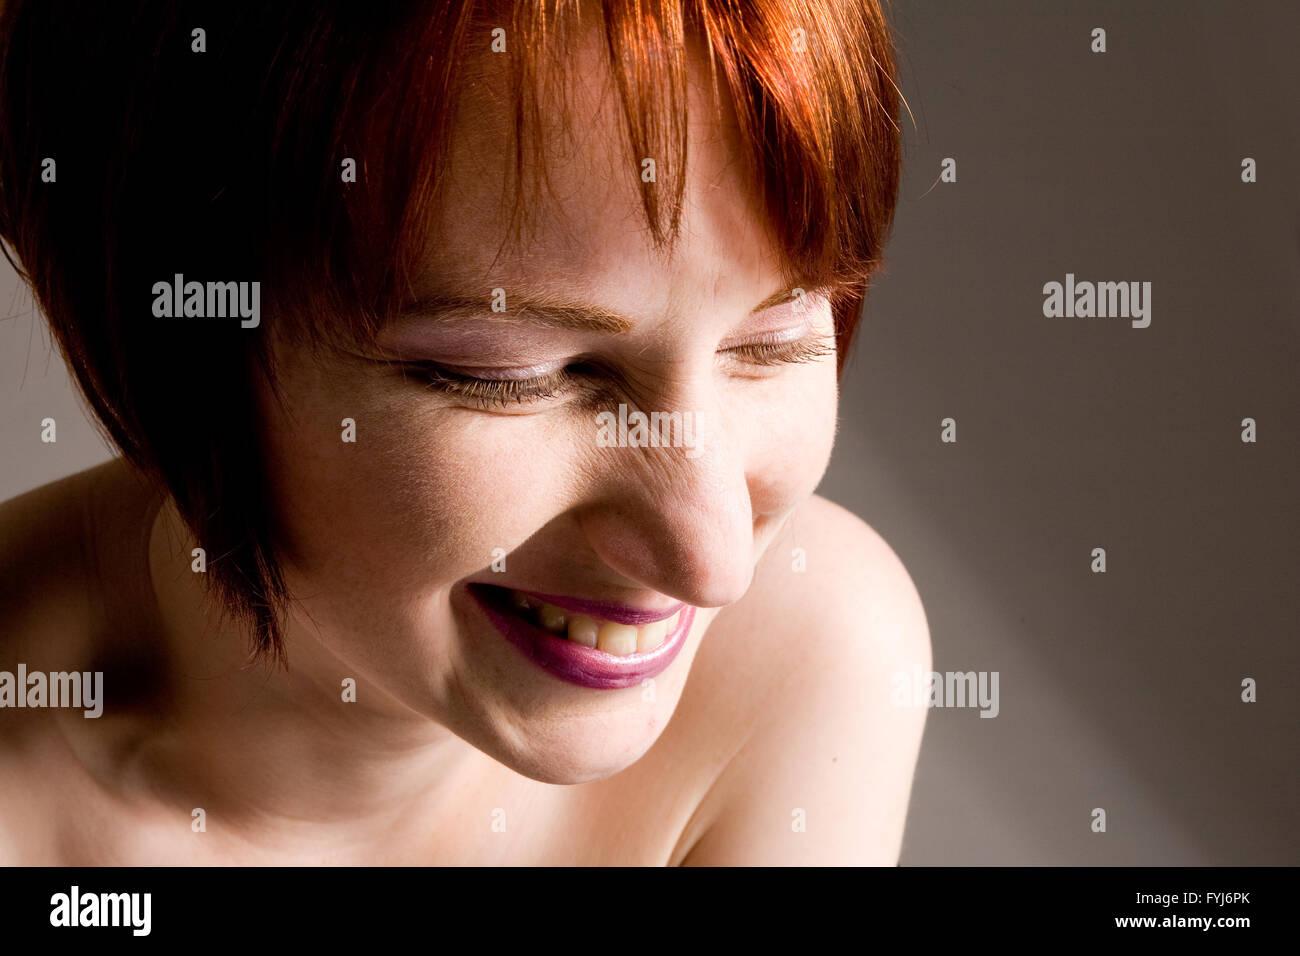 My emotive self - Stock Image